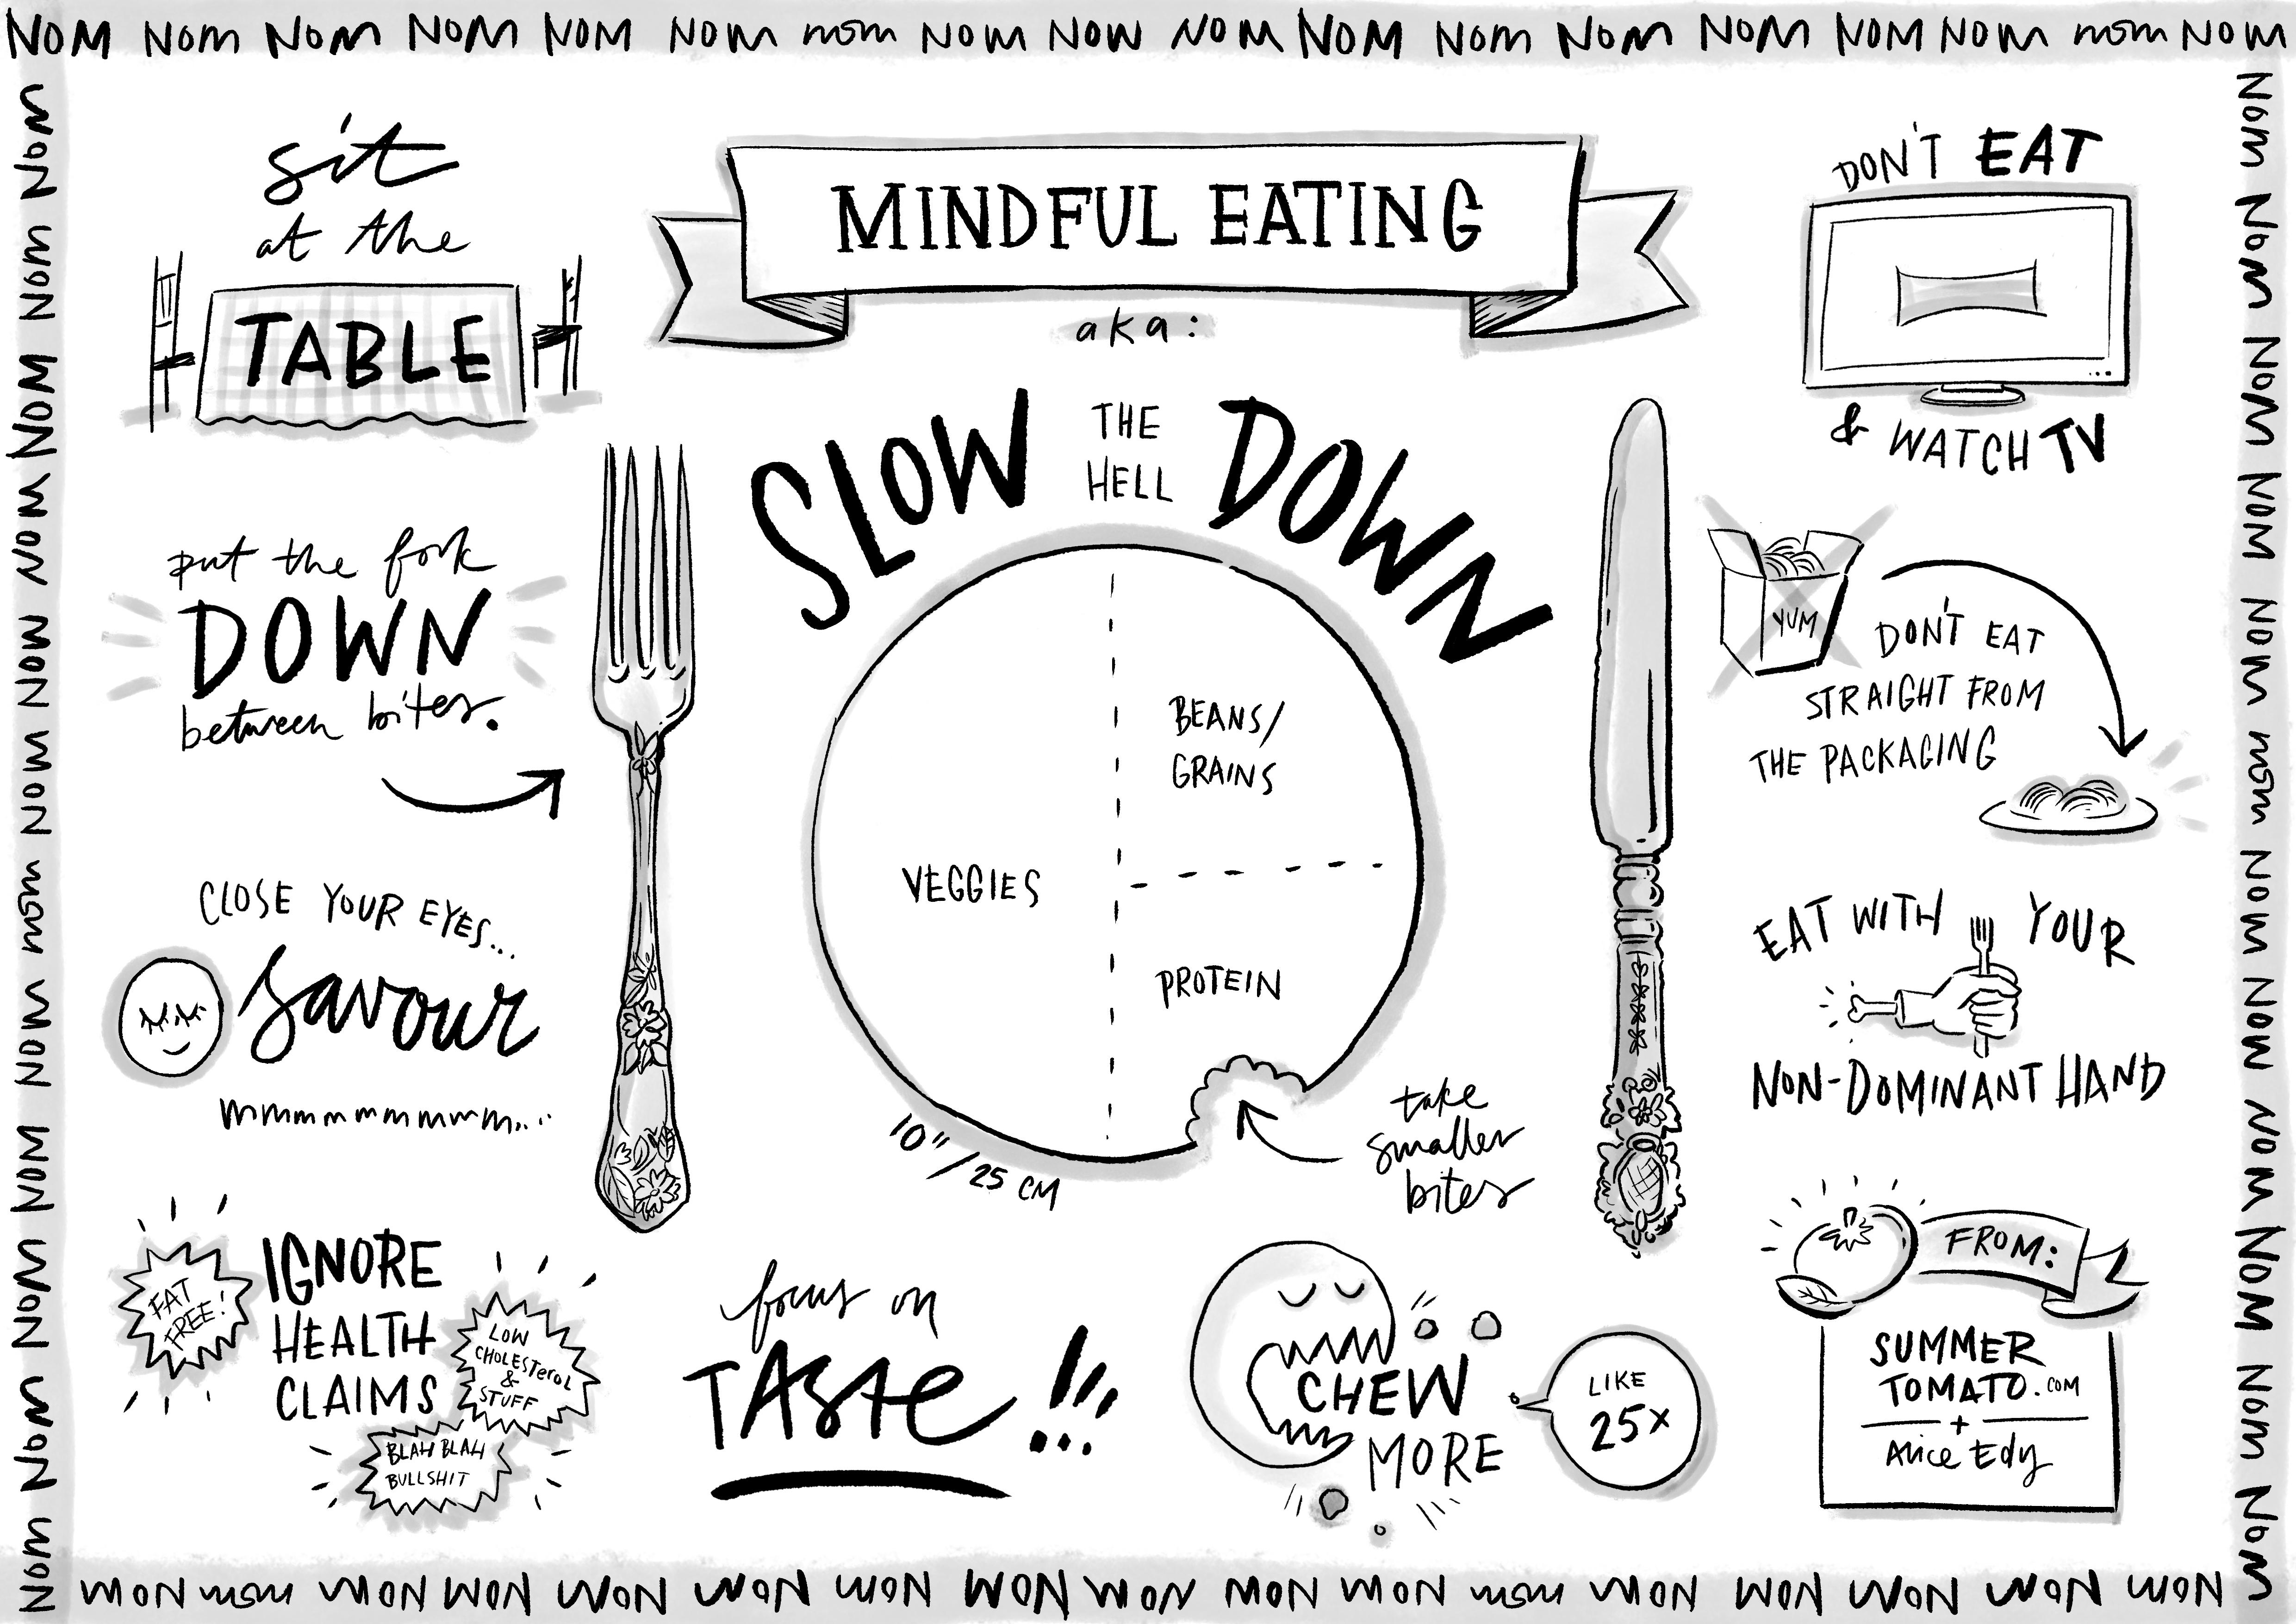 A Friendly Reminder On Eating Make It Mindful